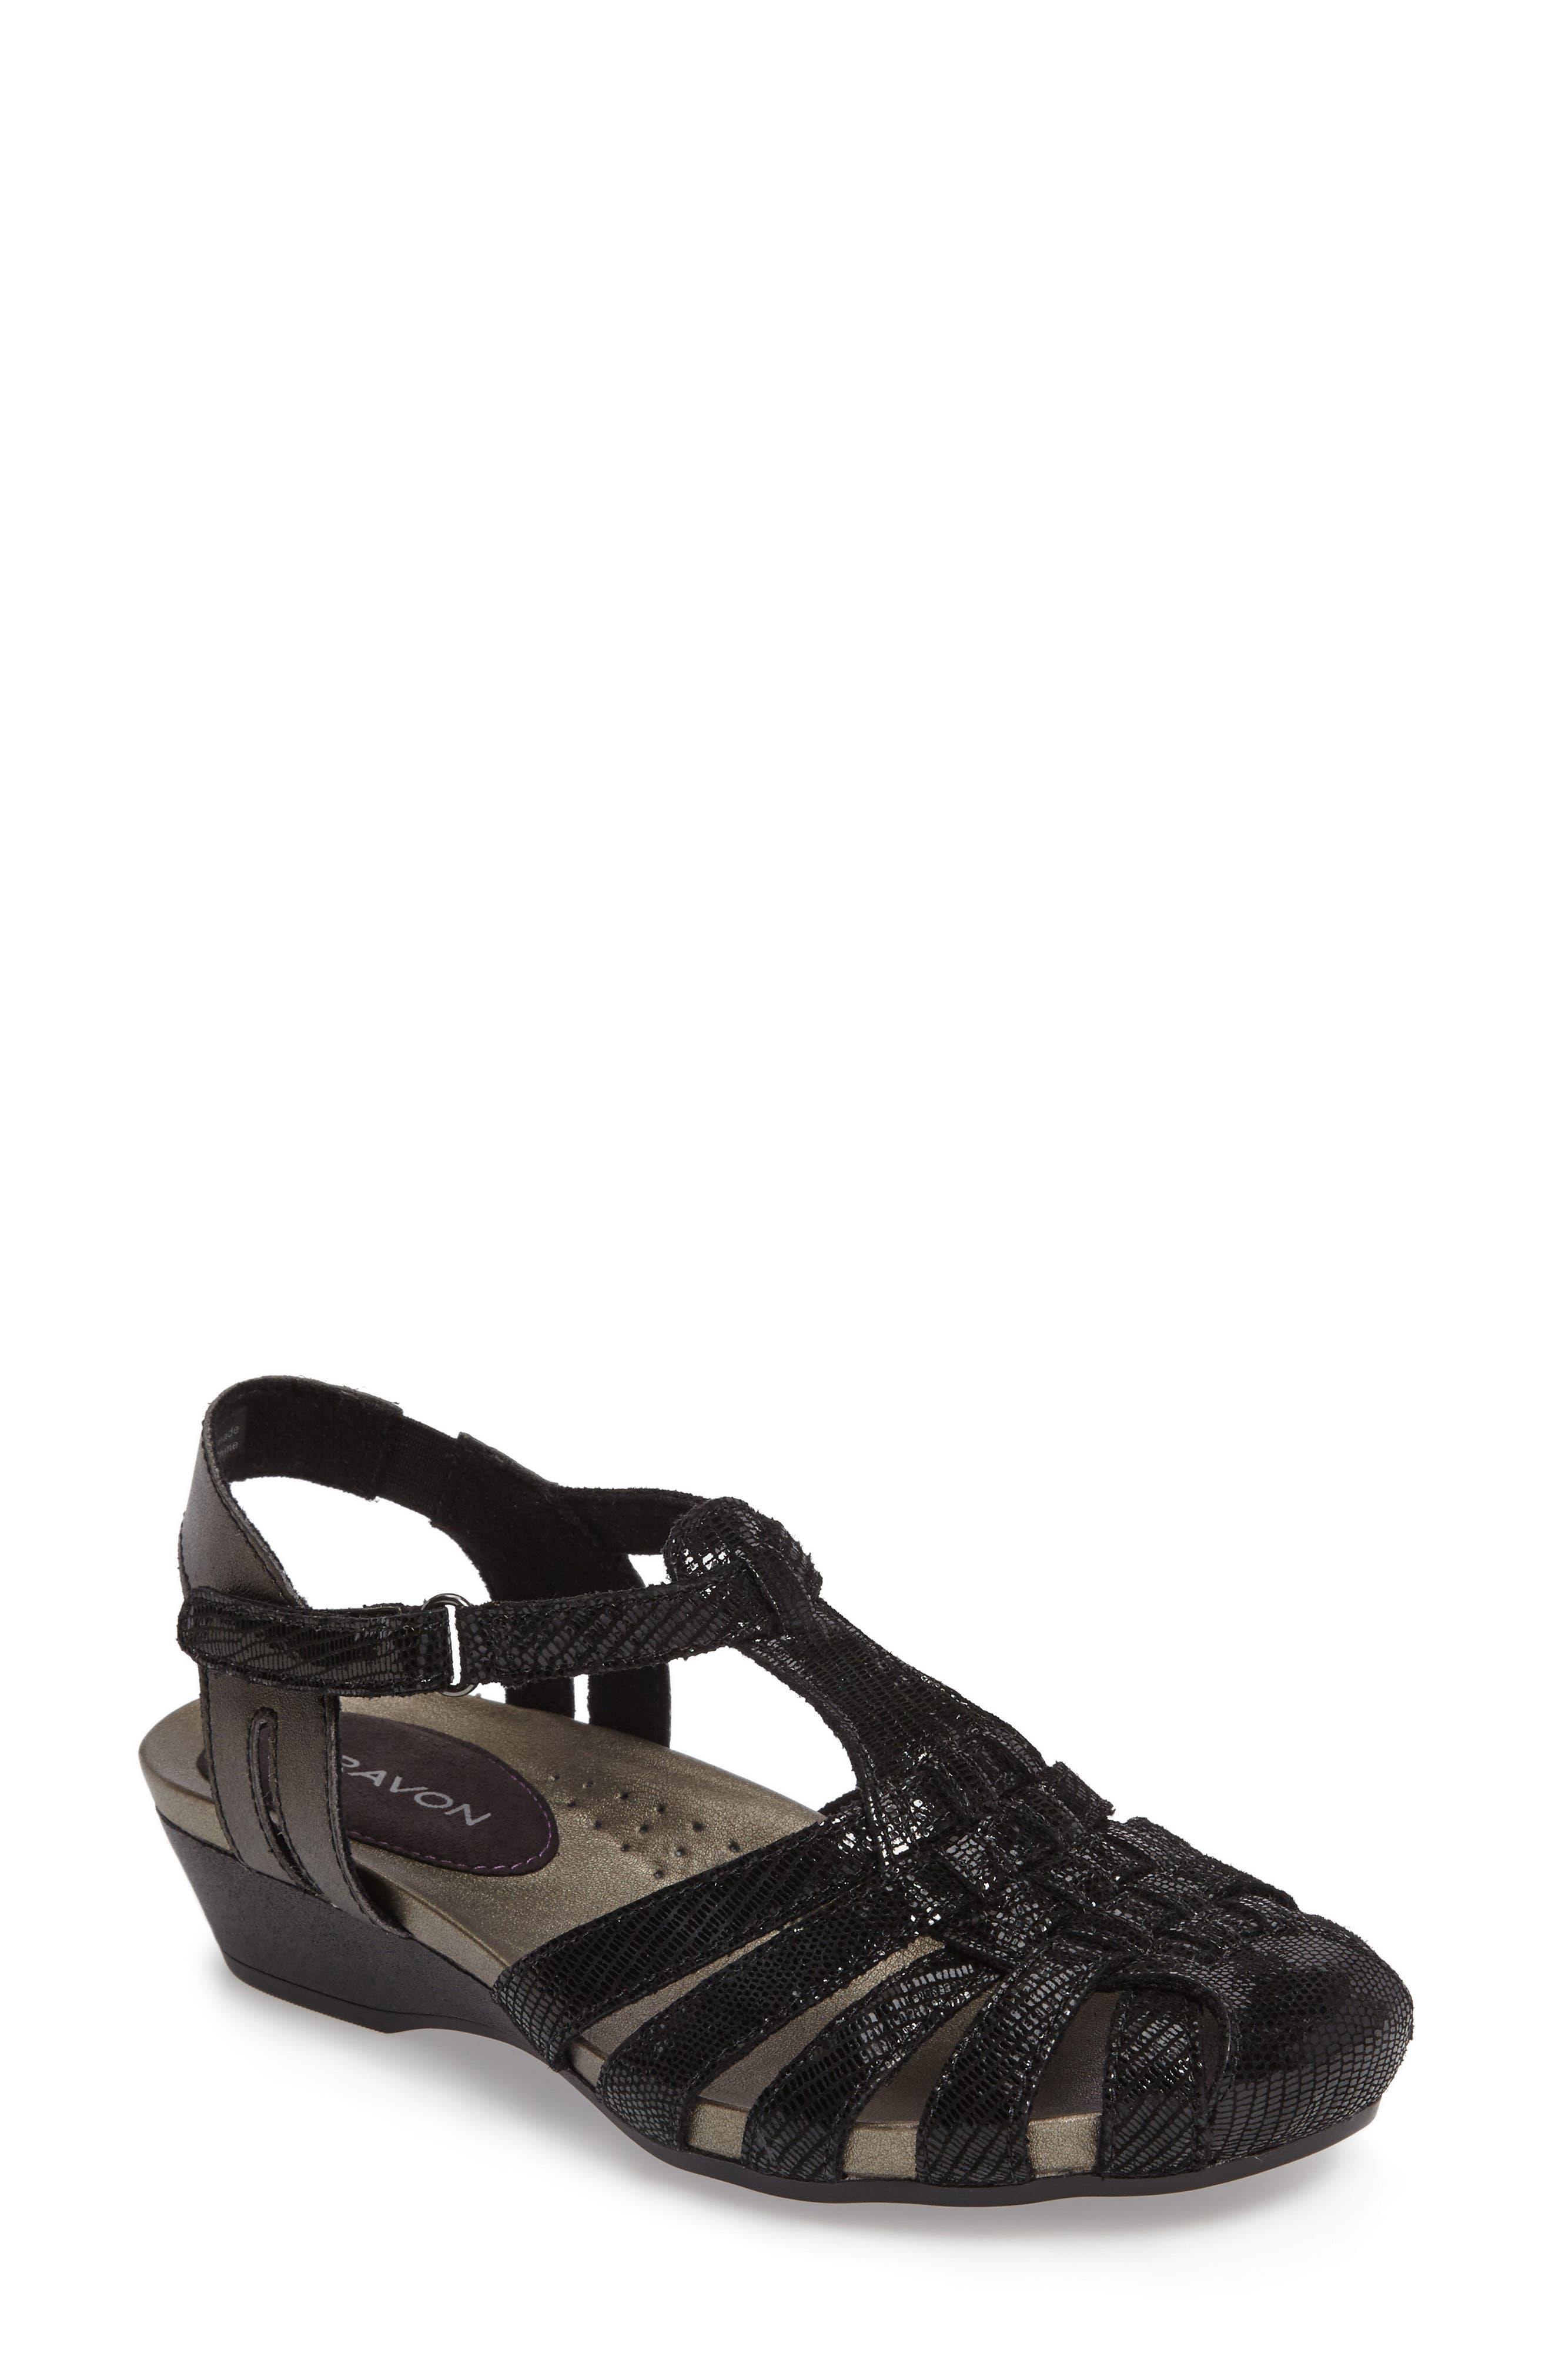 Standon Wedge Sandal,                             Main thumbnail 1, color,                             BLACK FABRIC